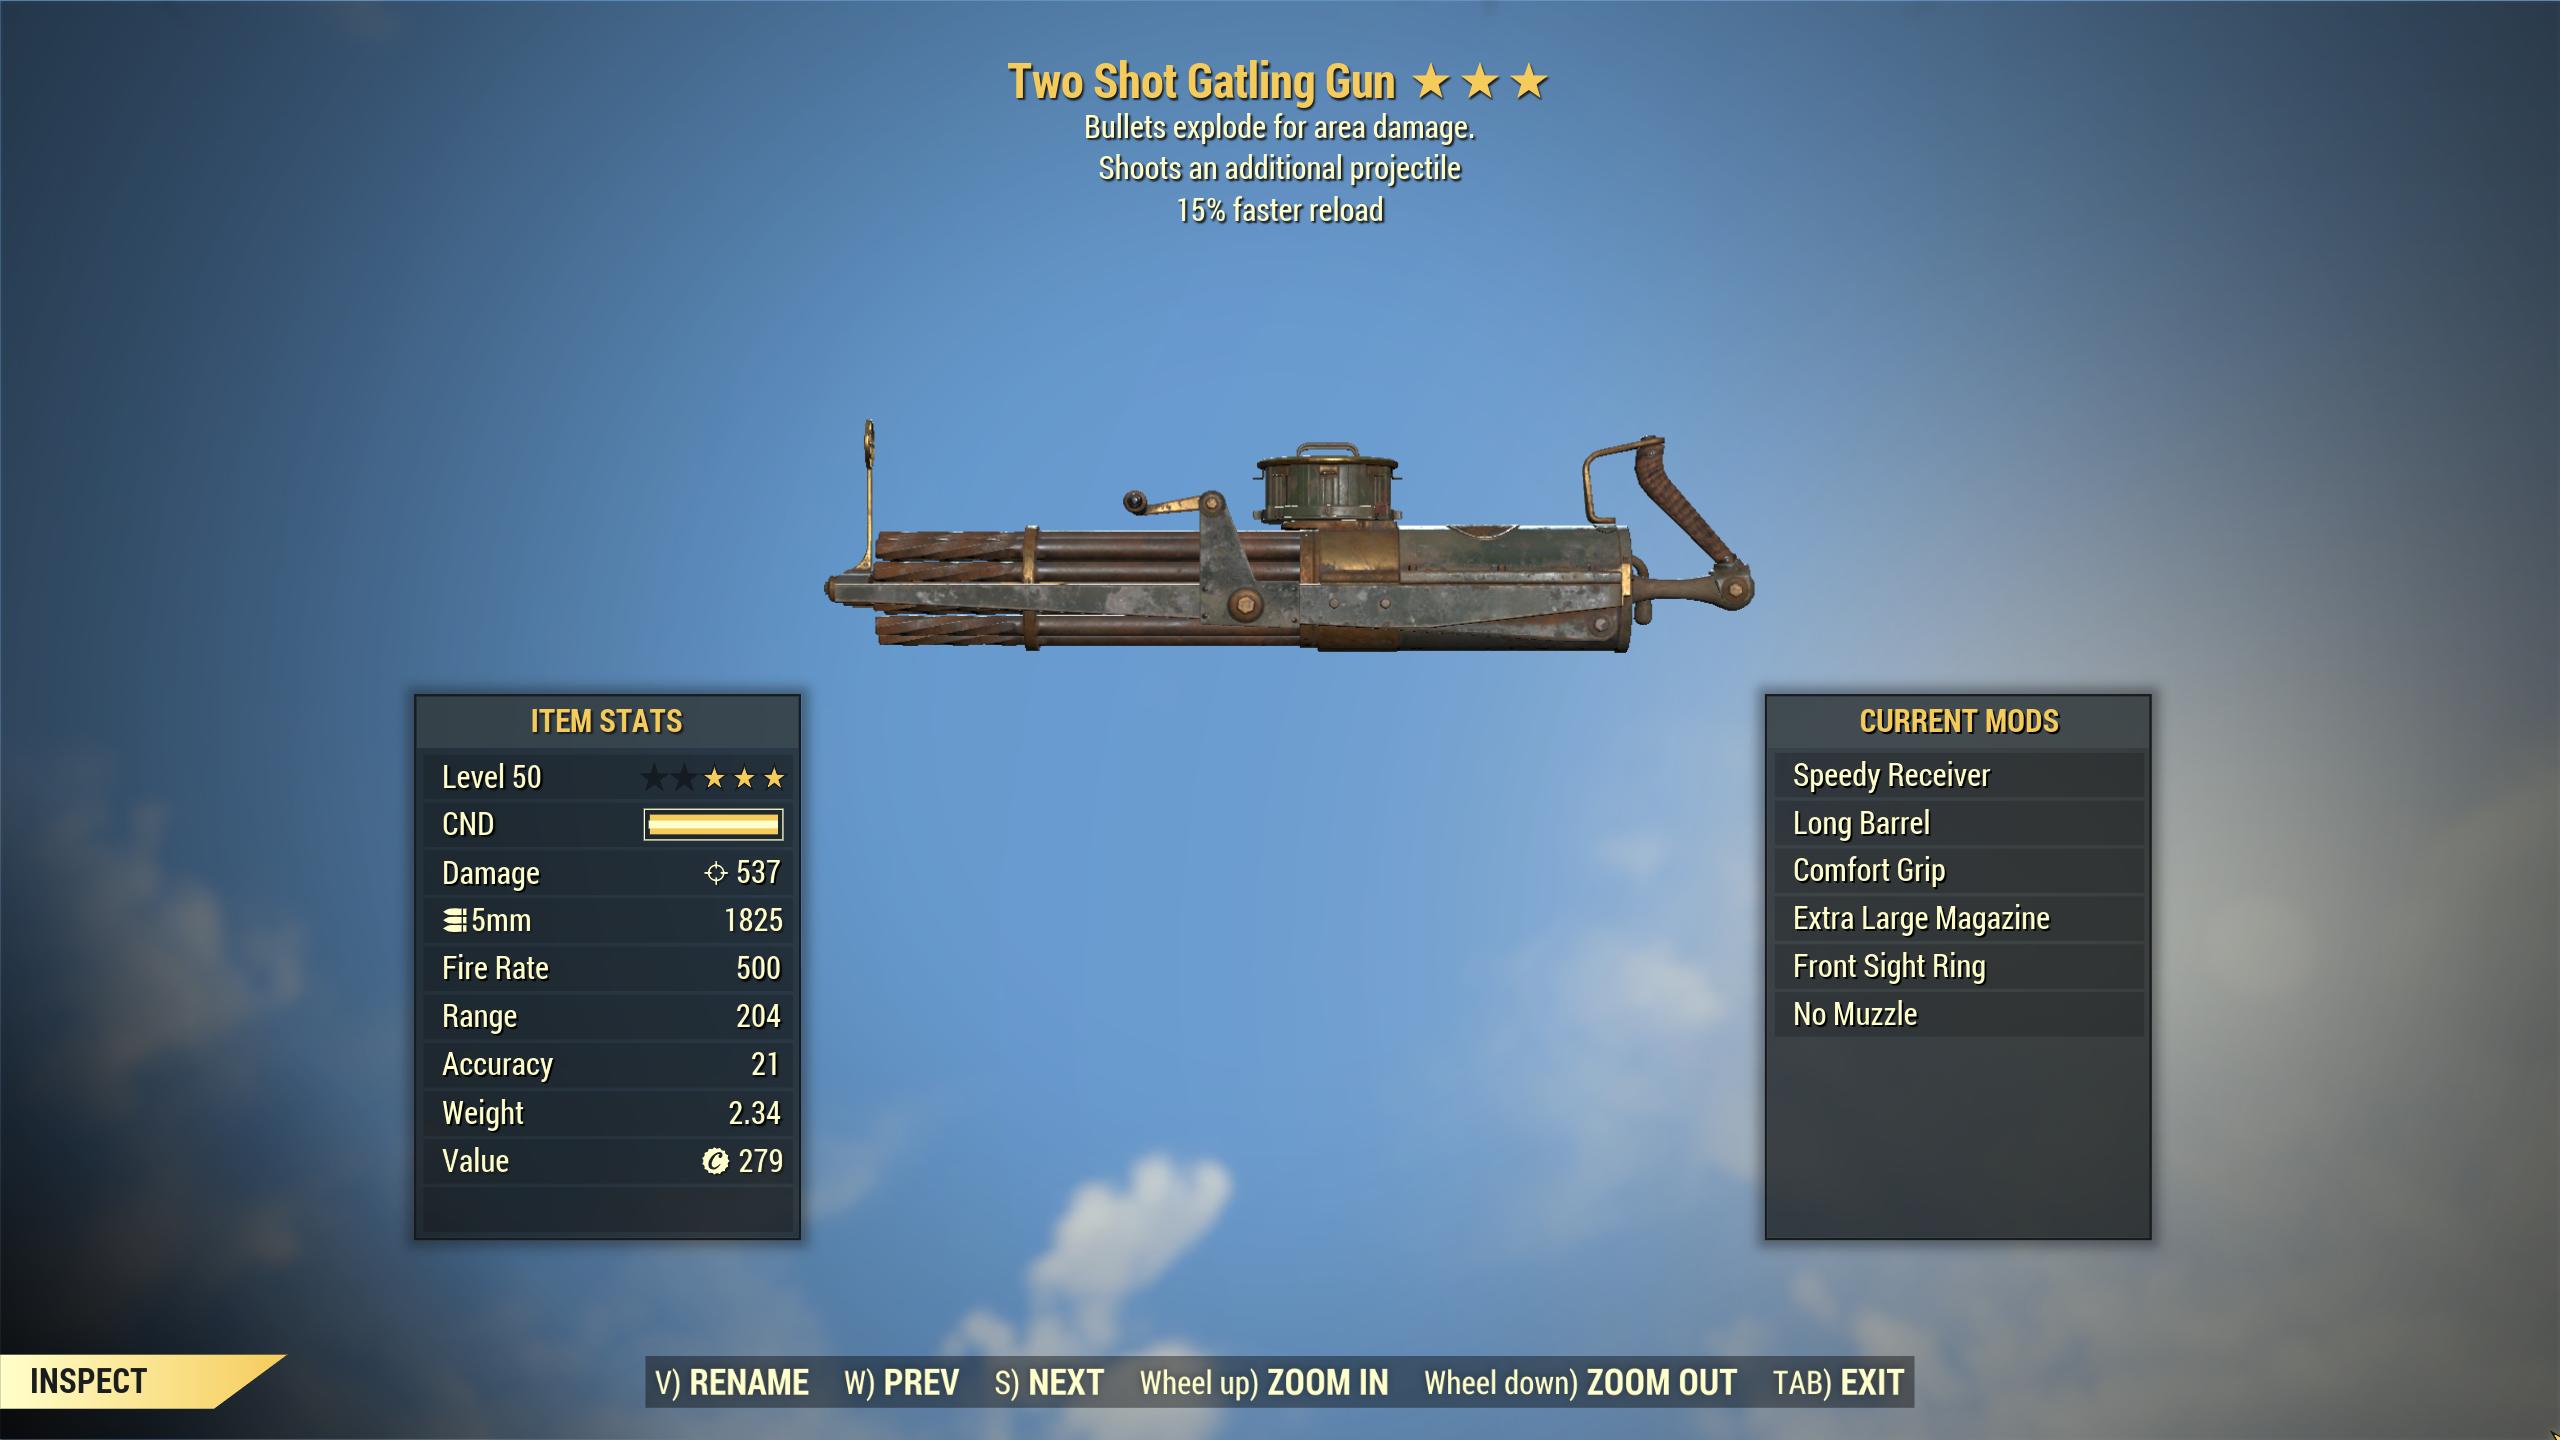 ★★★ Two Shot Explosive Gatling Gun[15% Faster Reload]   FAST DELIVERY  